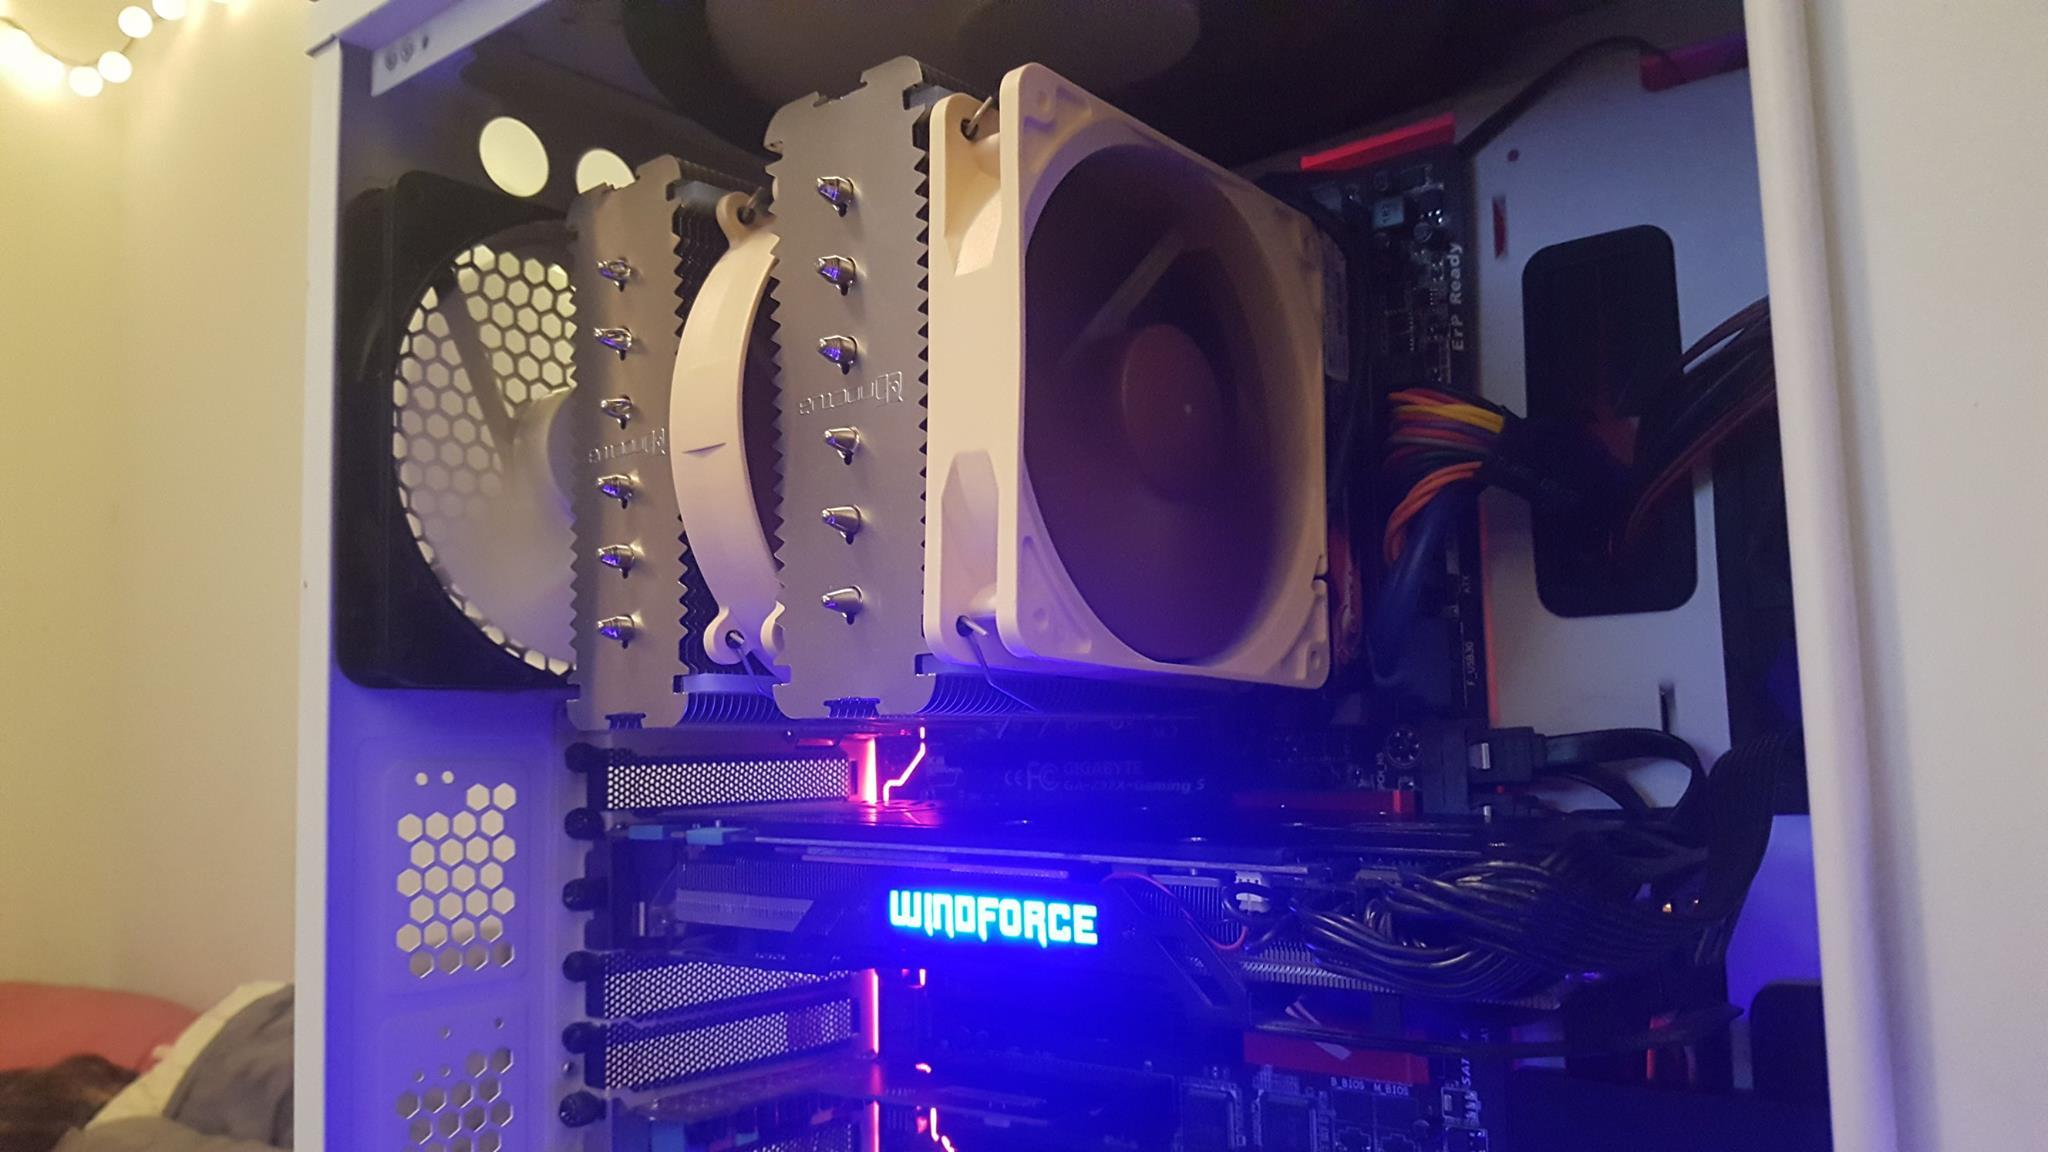 X-24: Hackintosh Windows 10 / Sierra Log & Info - Build a PC